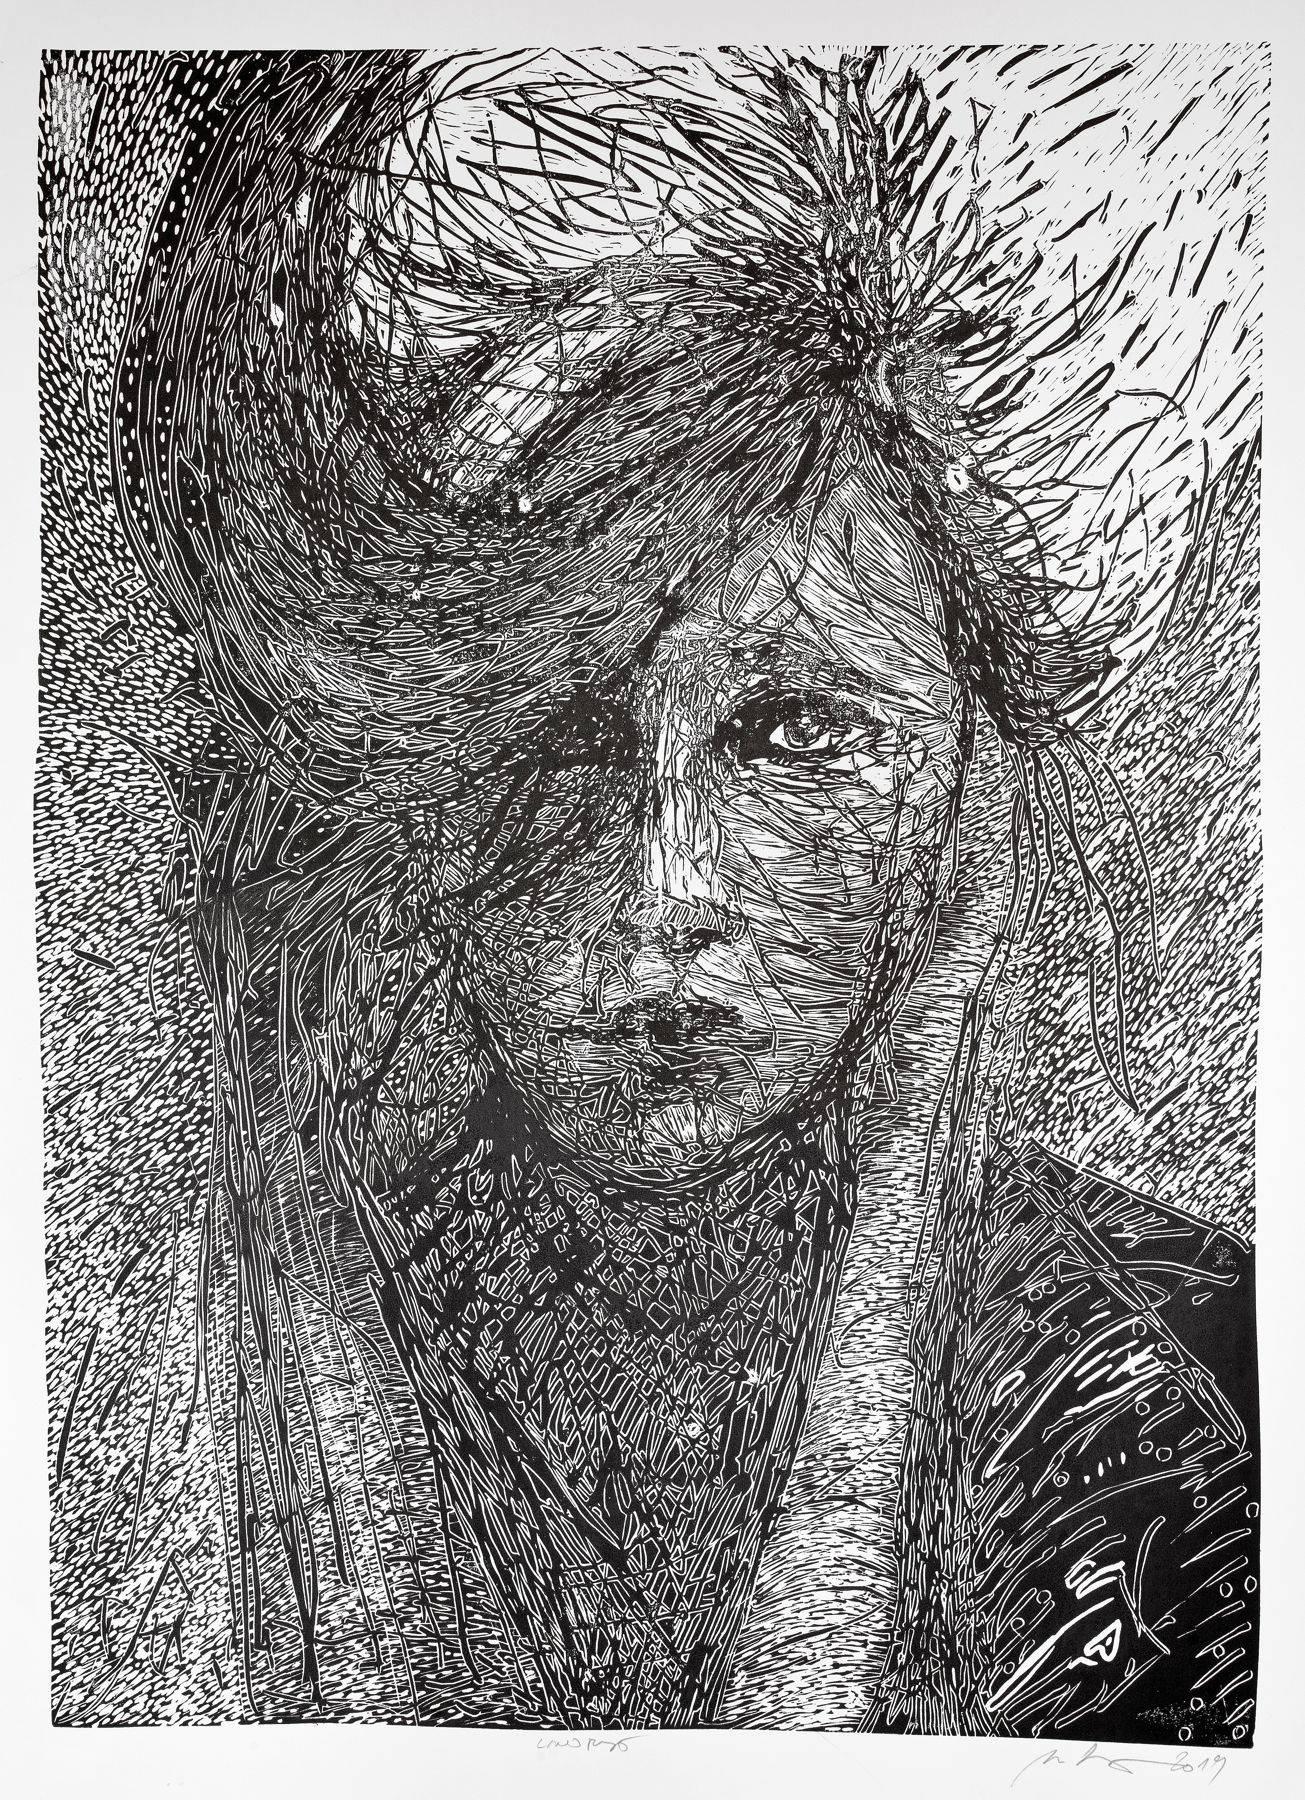 Miriam Kavuličová Tomašiaková – Bez názvu 1, linoryt, papier, 2019